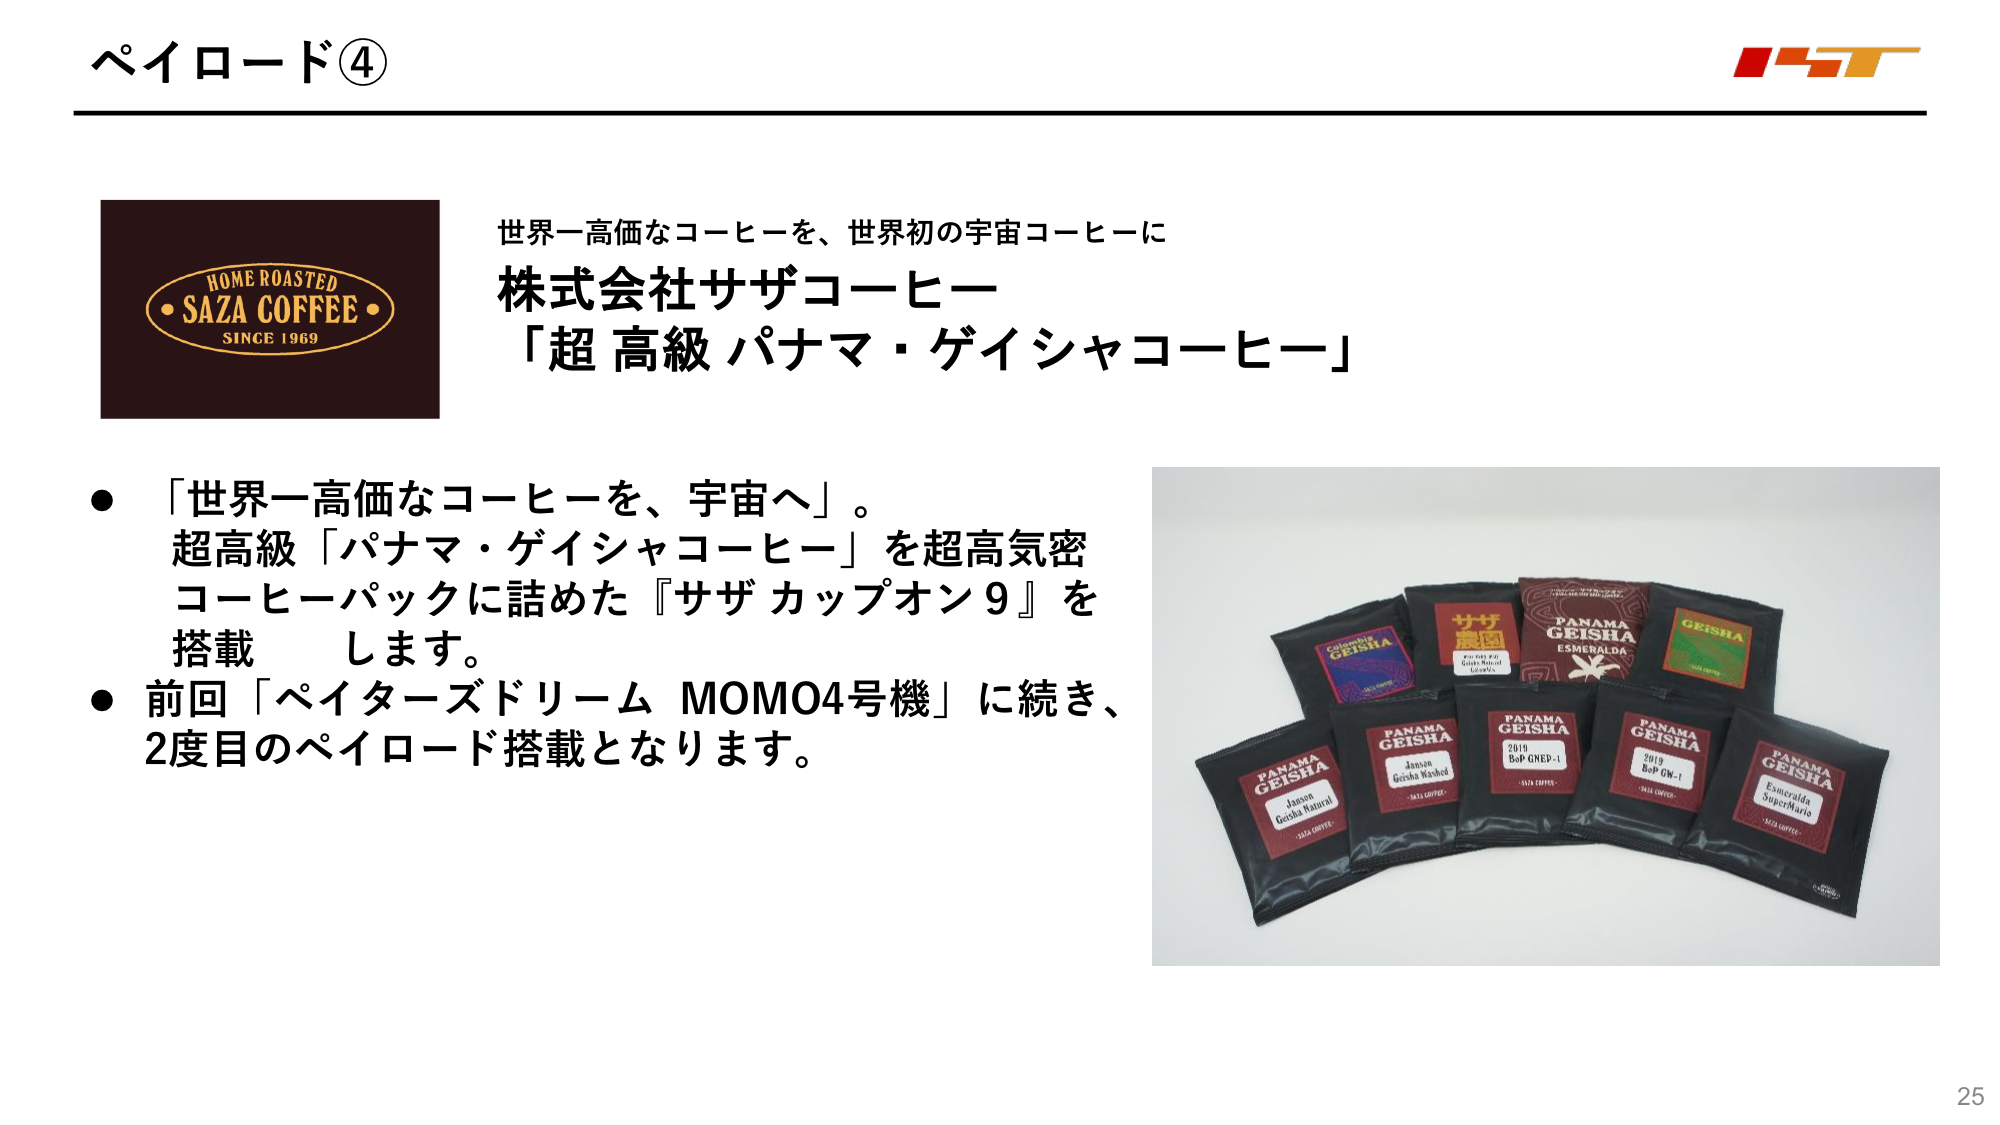 f:id:Imamura:20191126135237p:plain